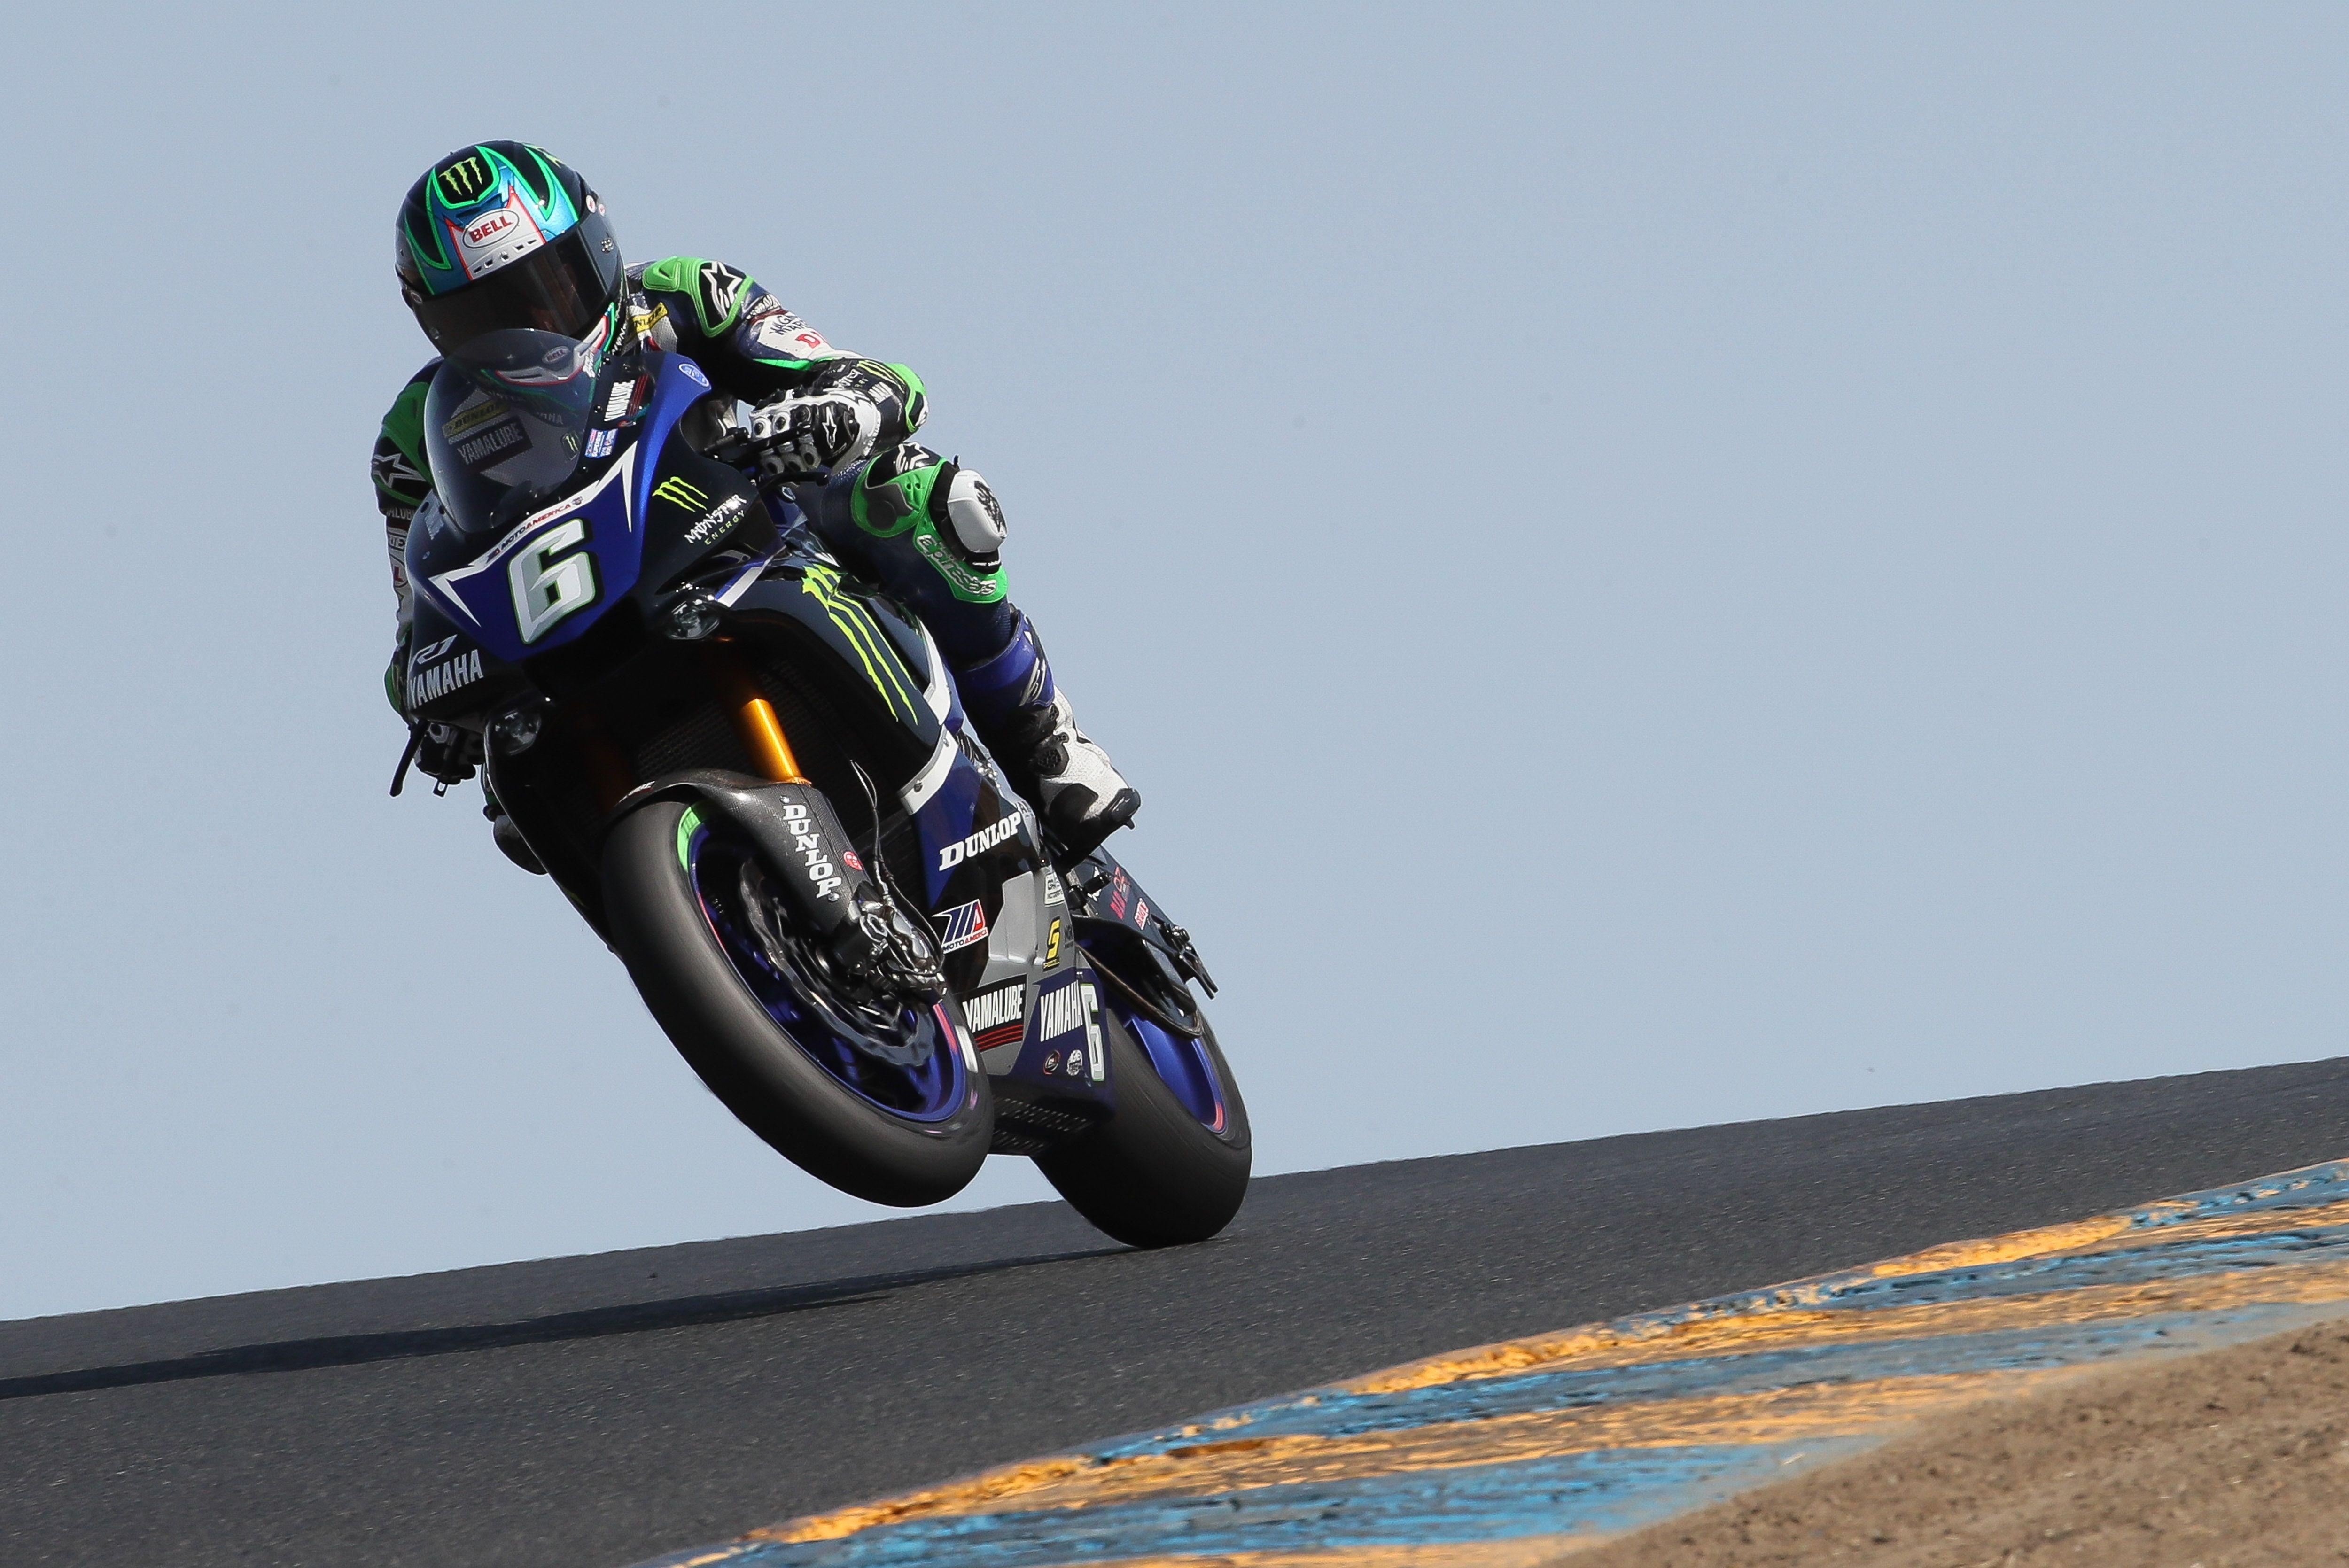 The Great American Motorcycle Racing Revival